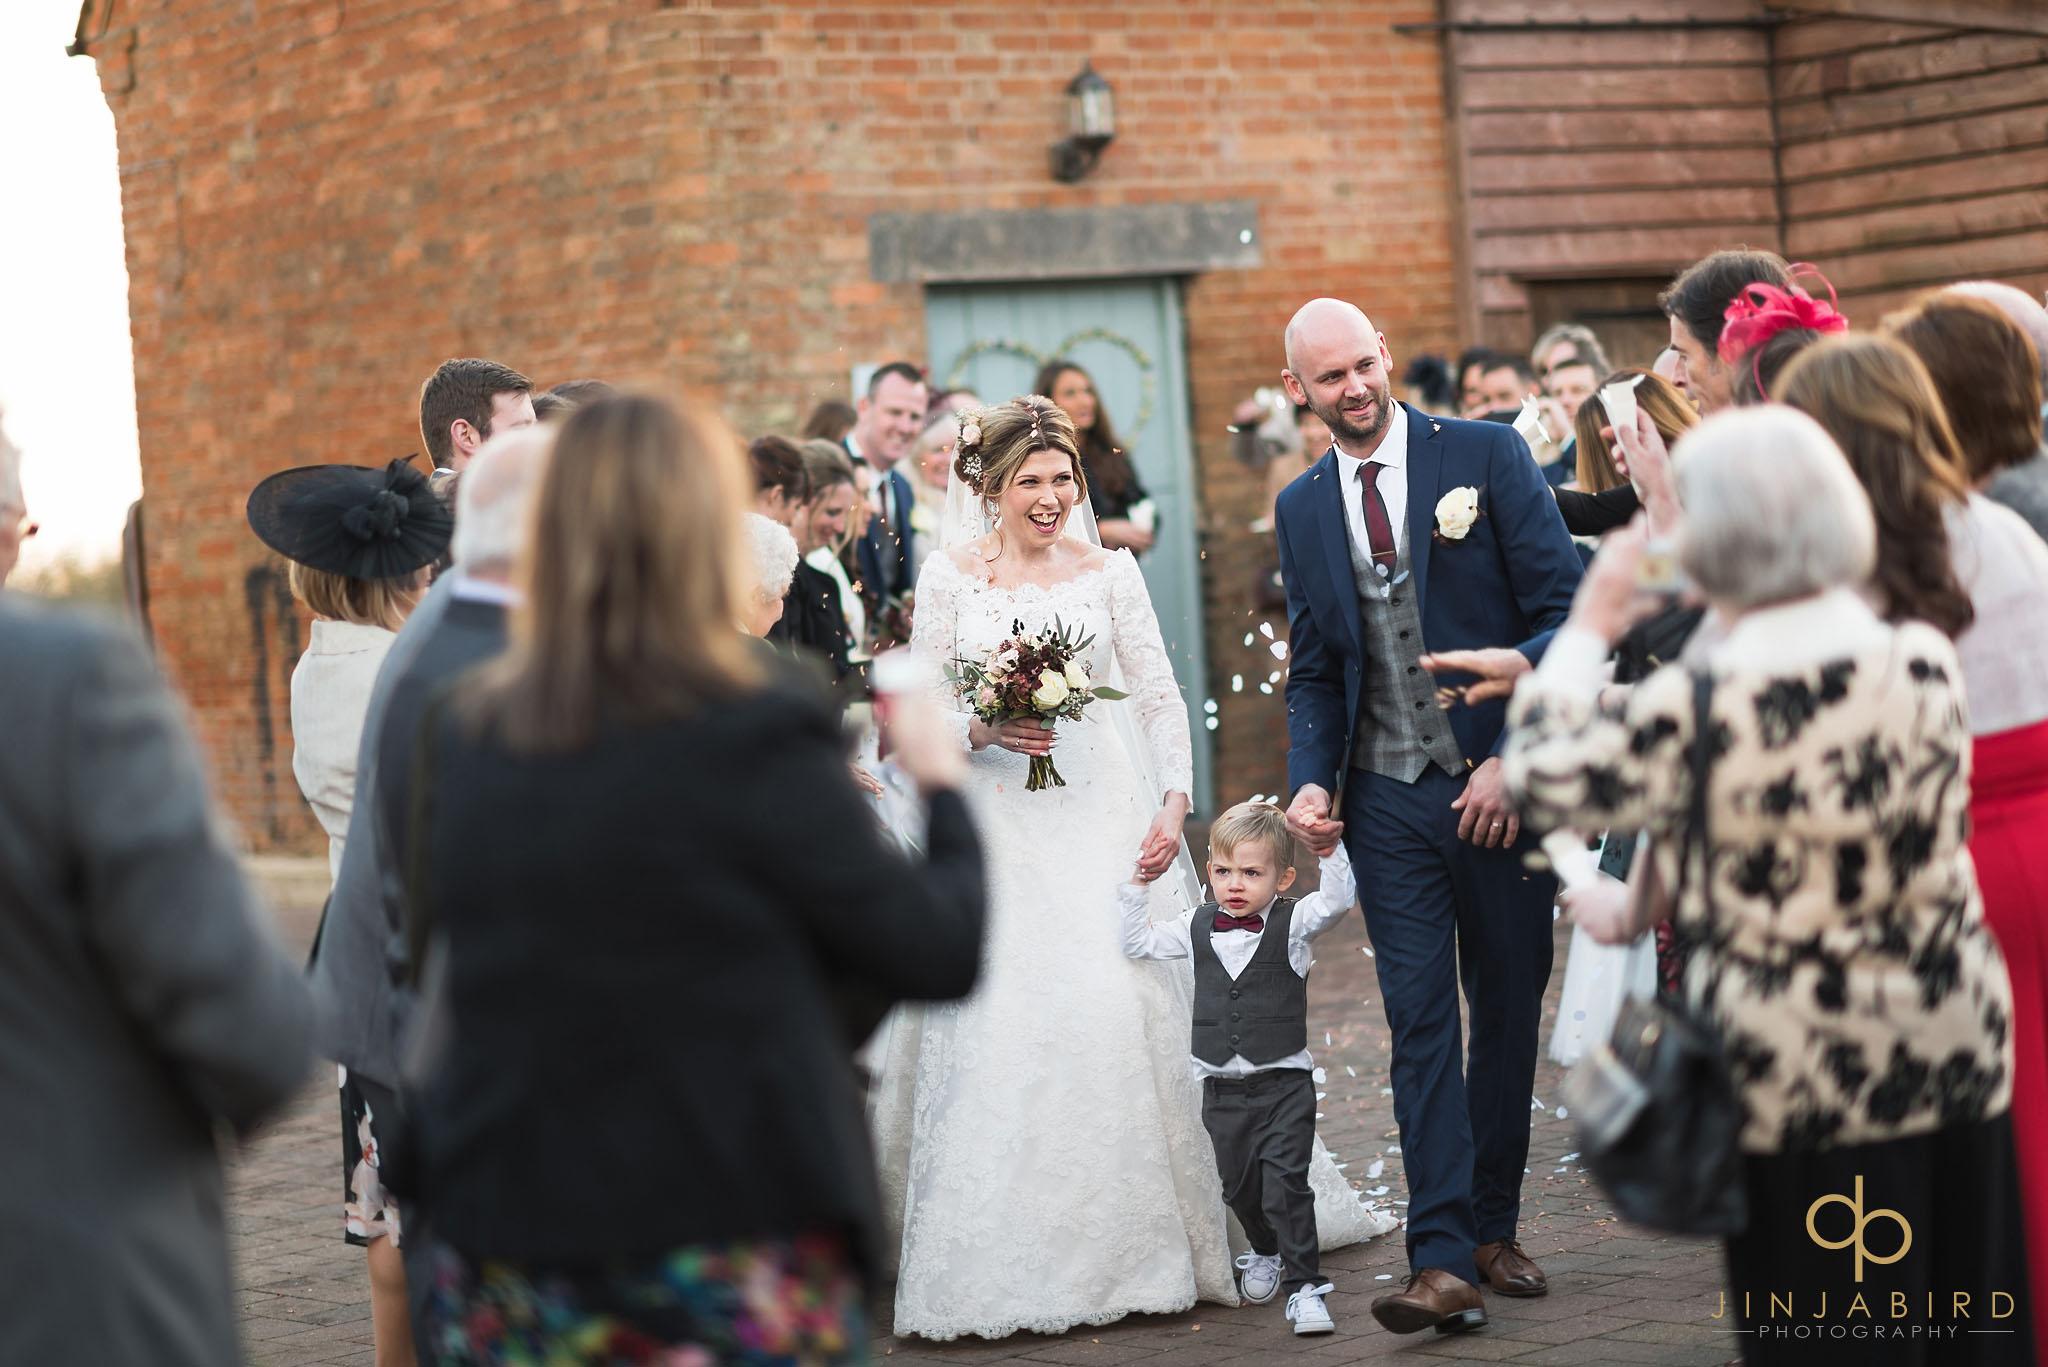 bride and groom wedding confetti